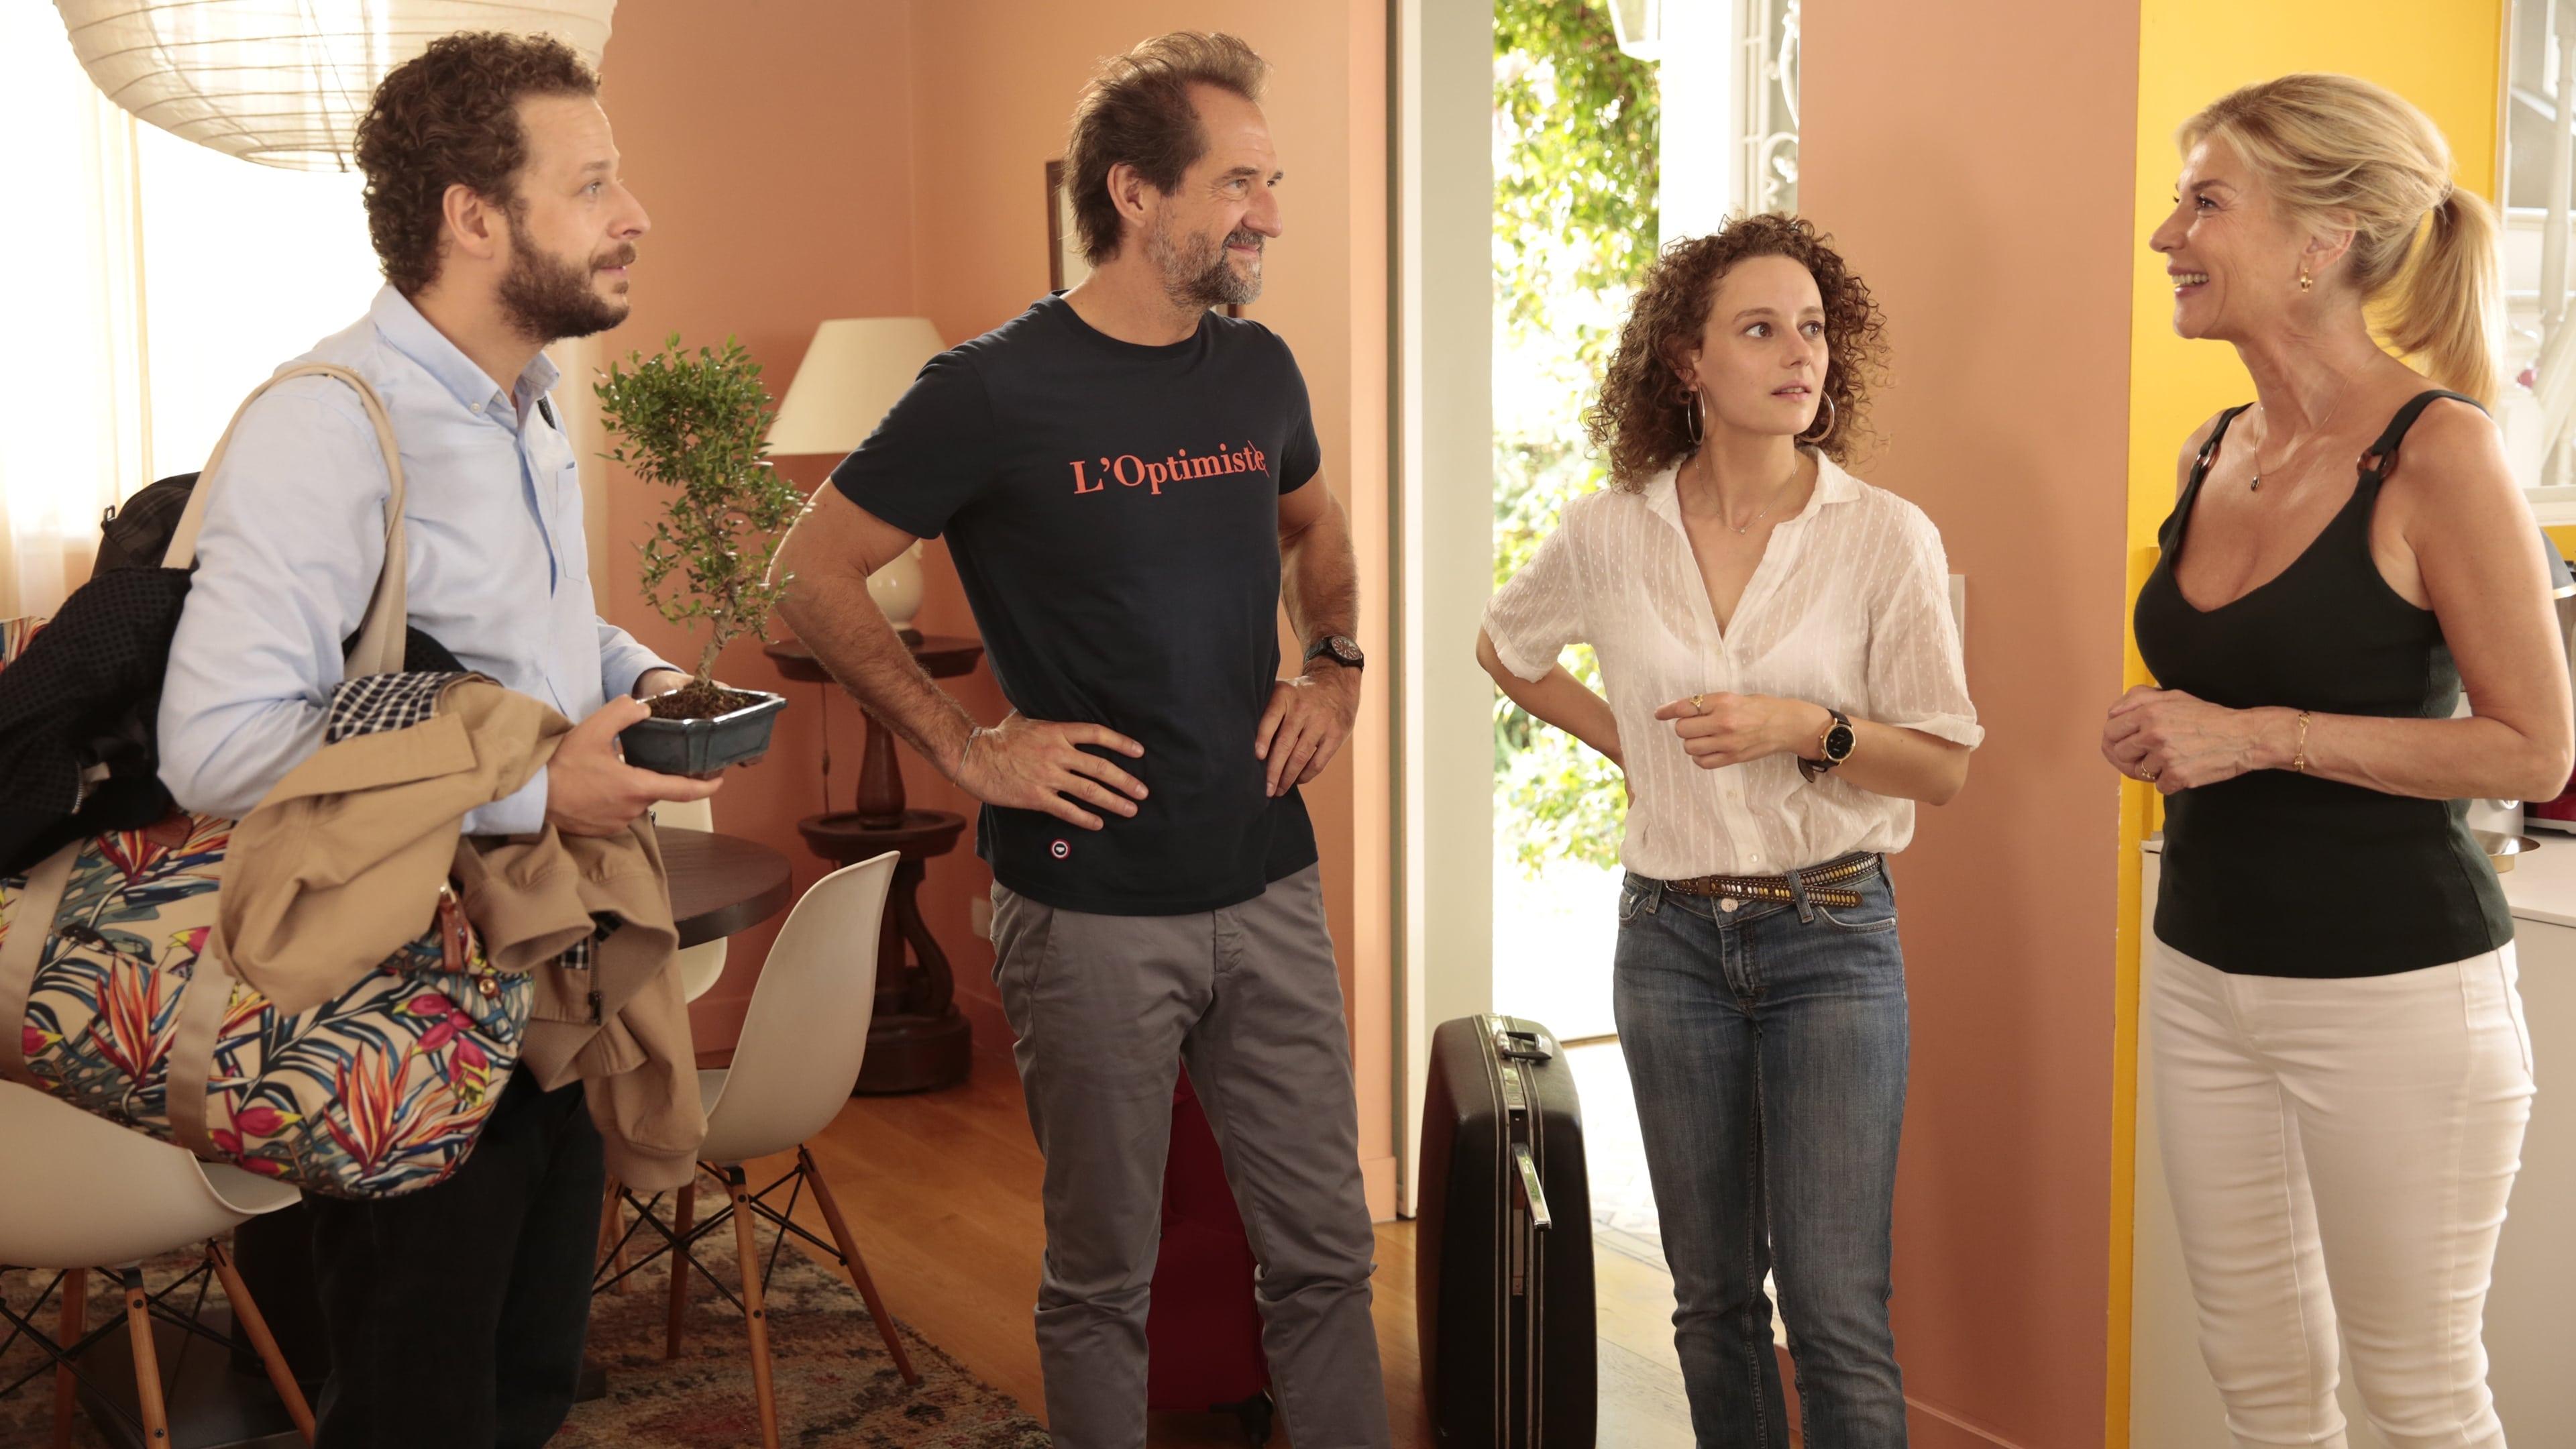 Mamahotel online teljes film 2021